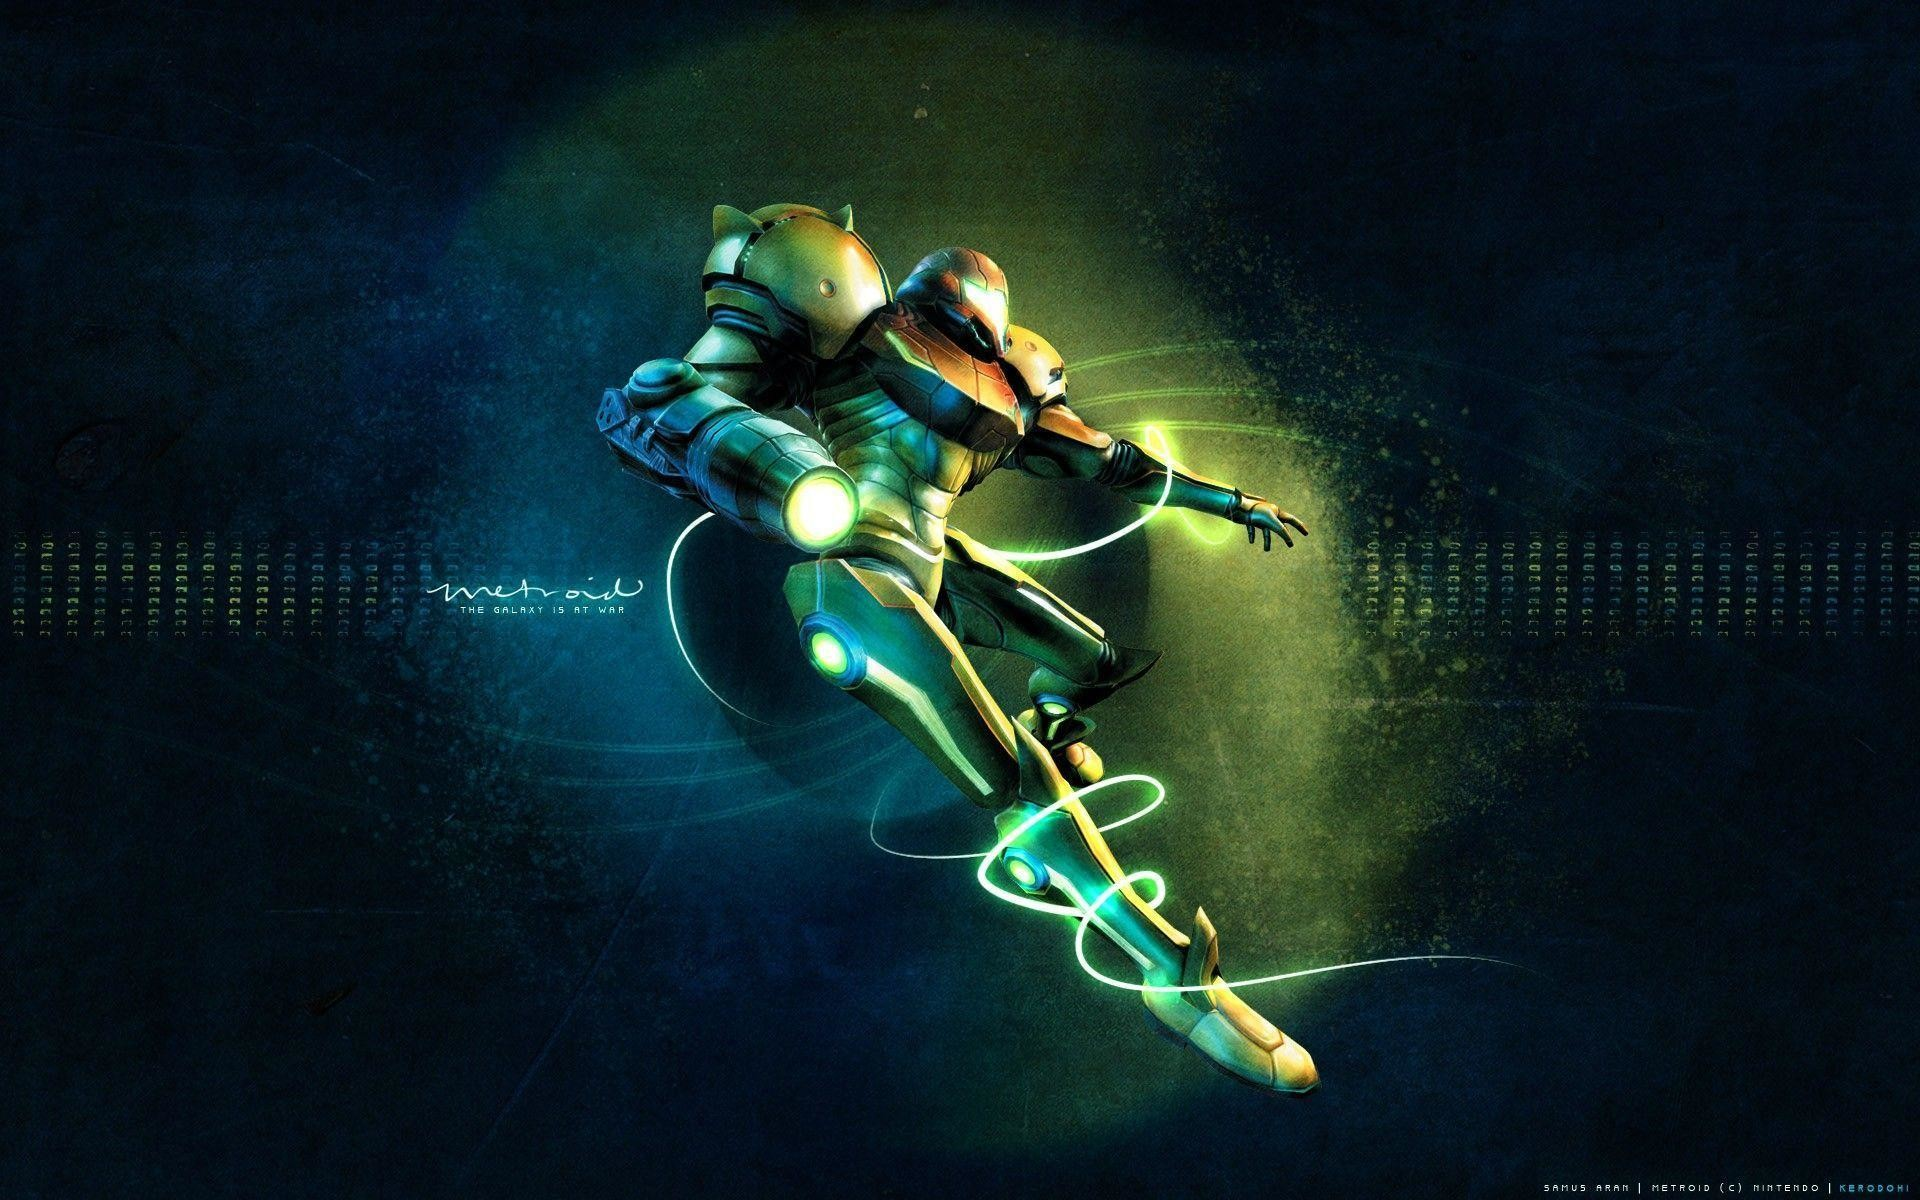 Wallpapers For > Metroid Prime 2 Wallpaper